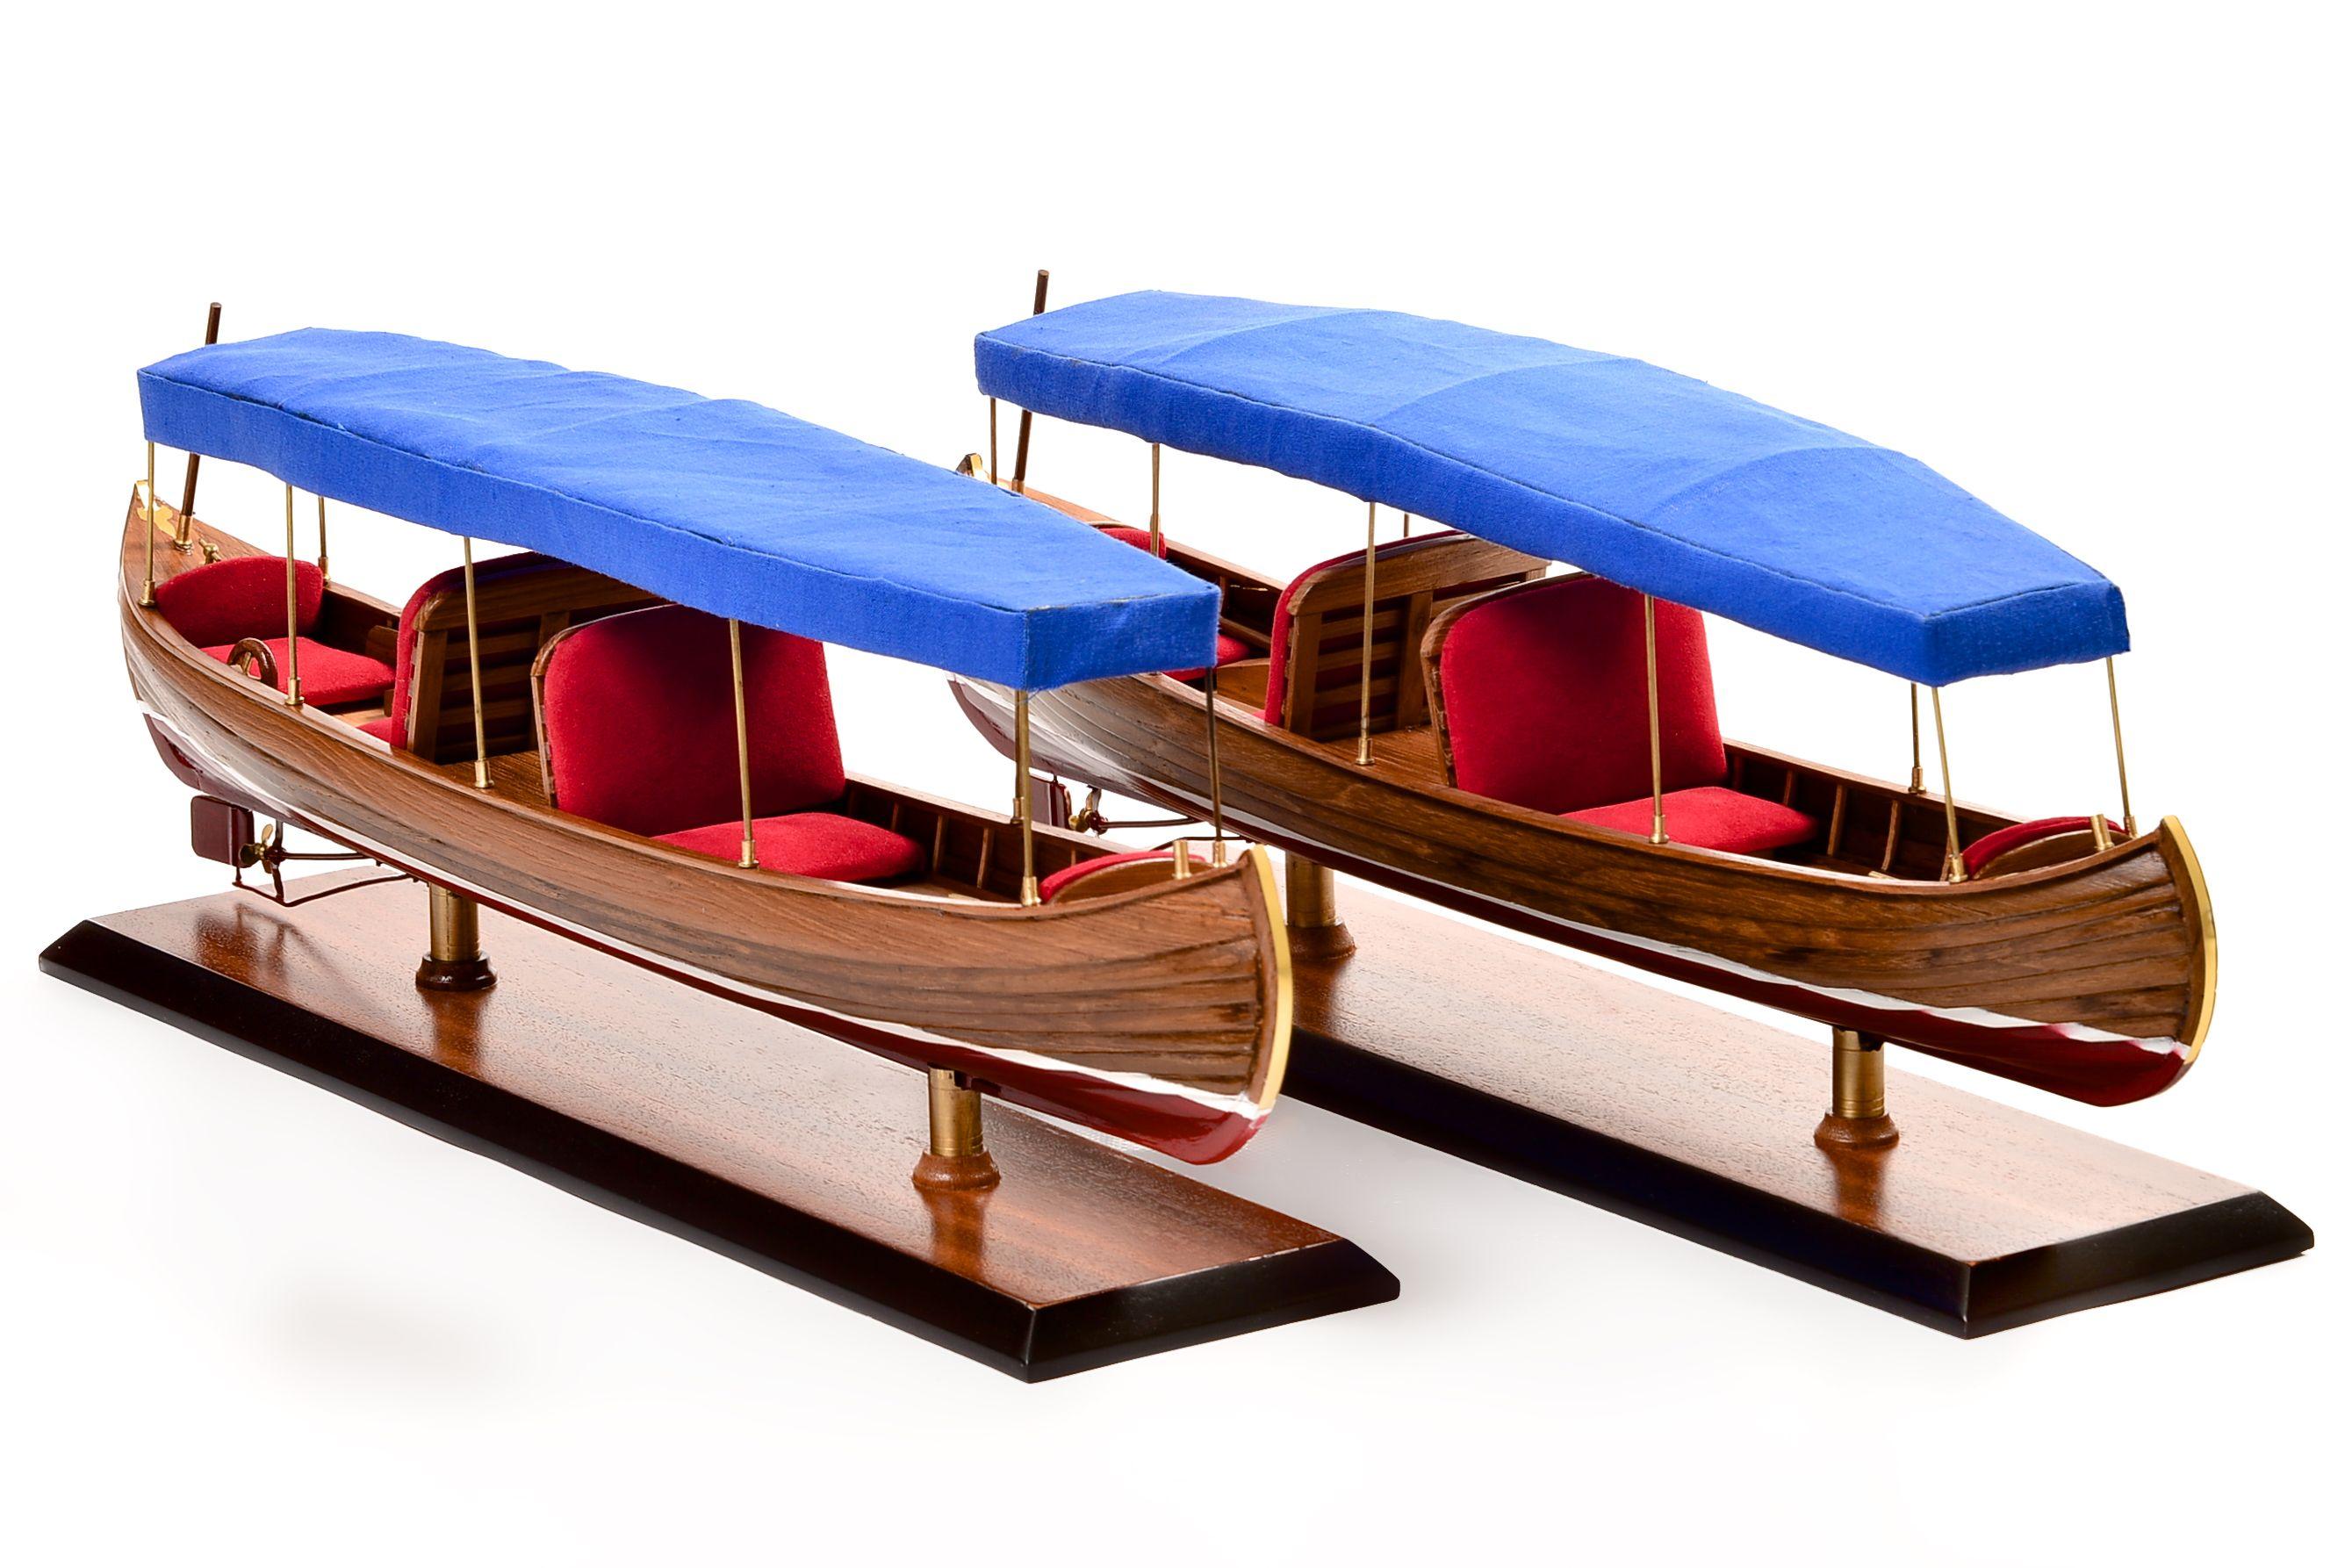 1865-11245-Liddesdale-Electric-Canoe-1920